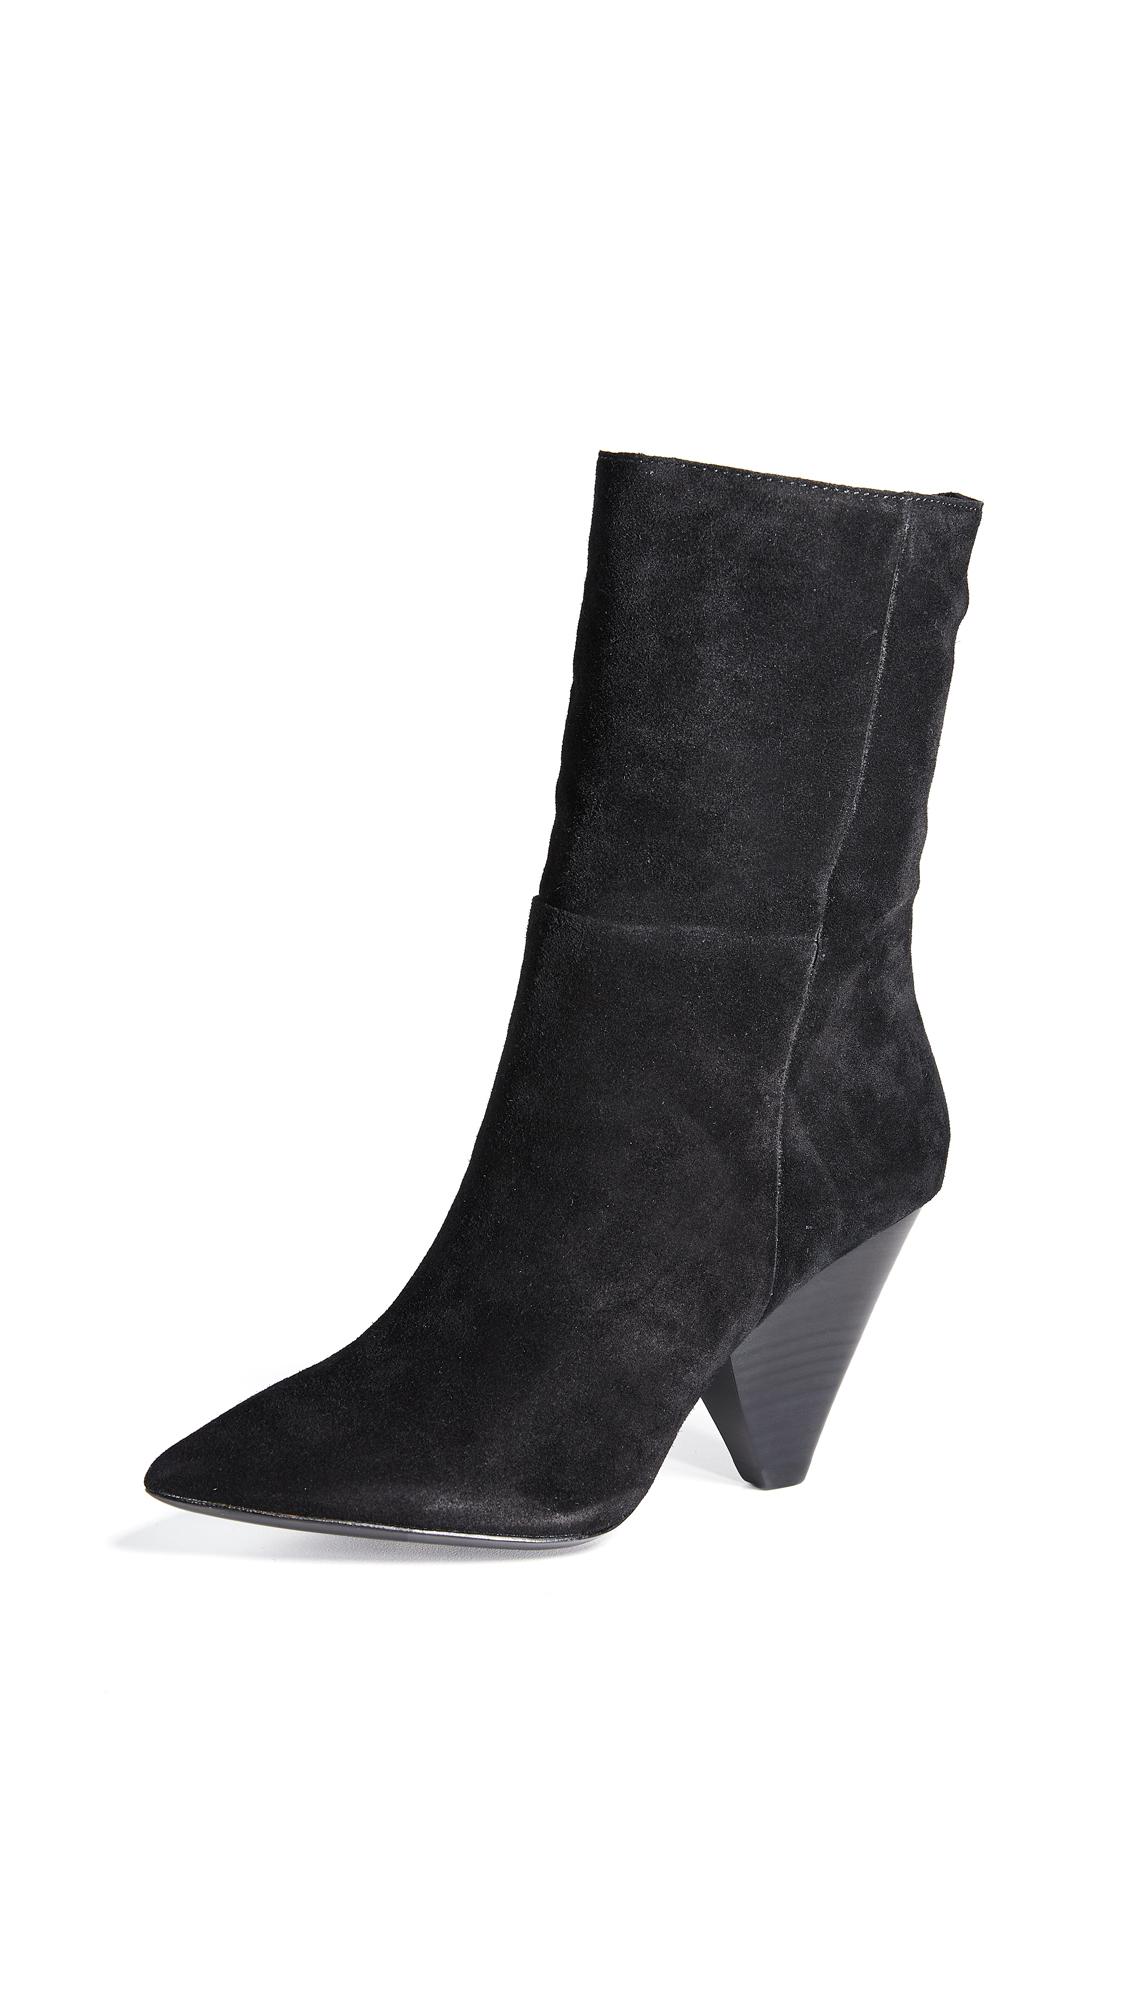 Ash Doll Boots - Black